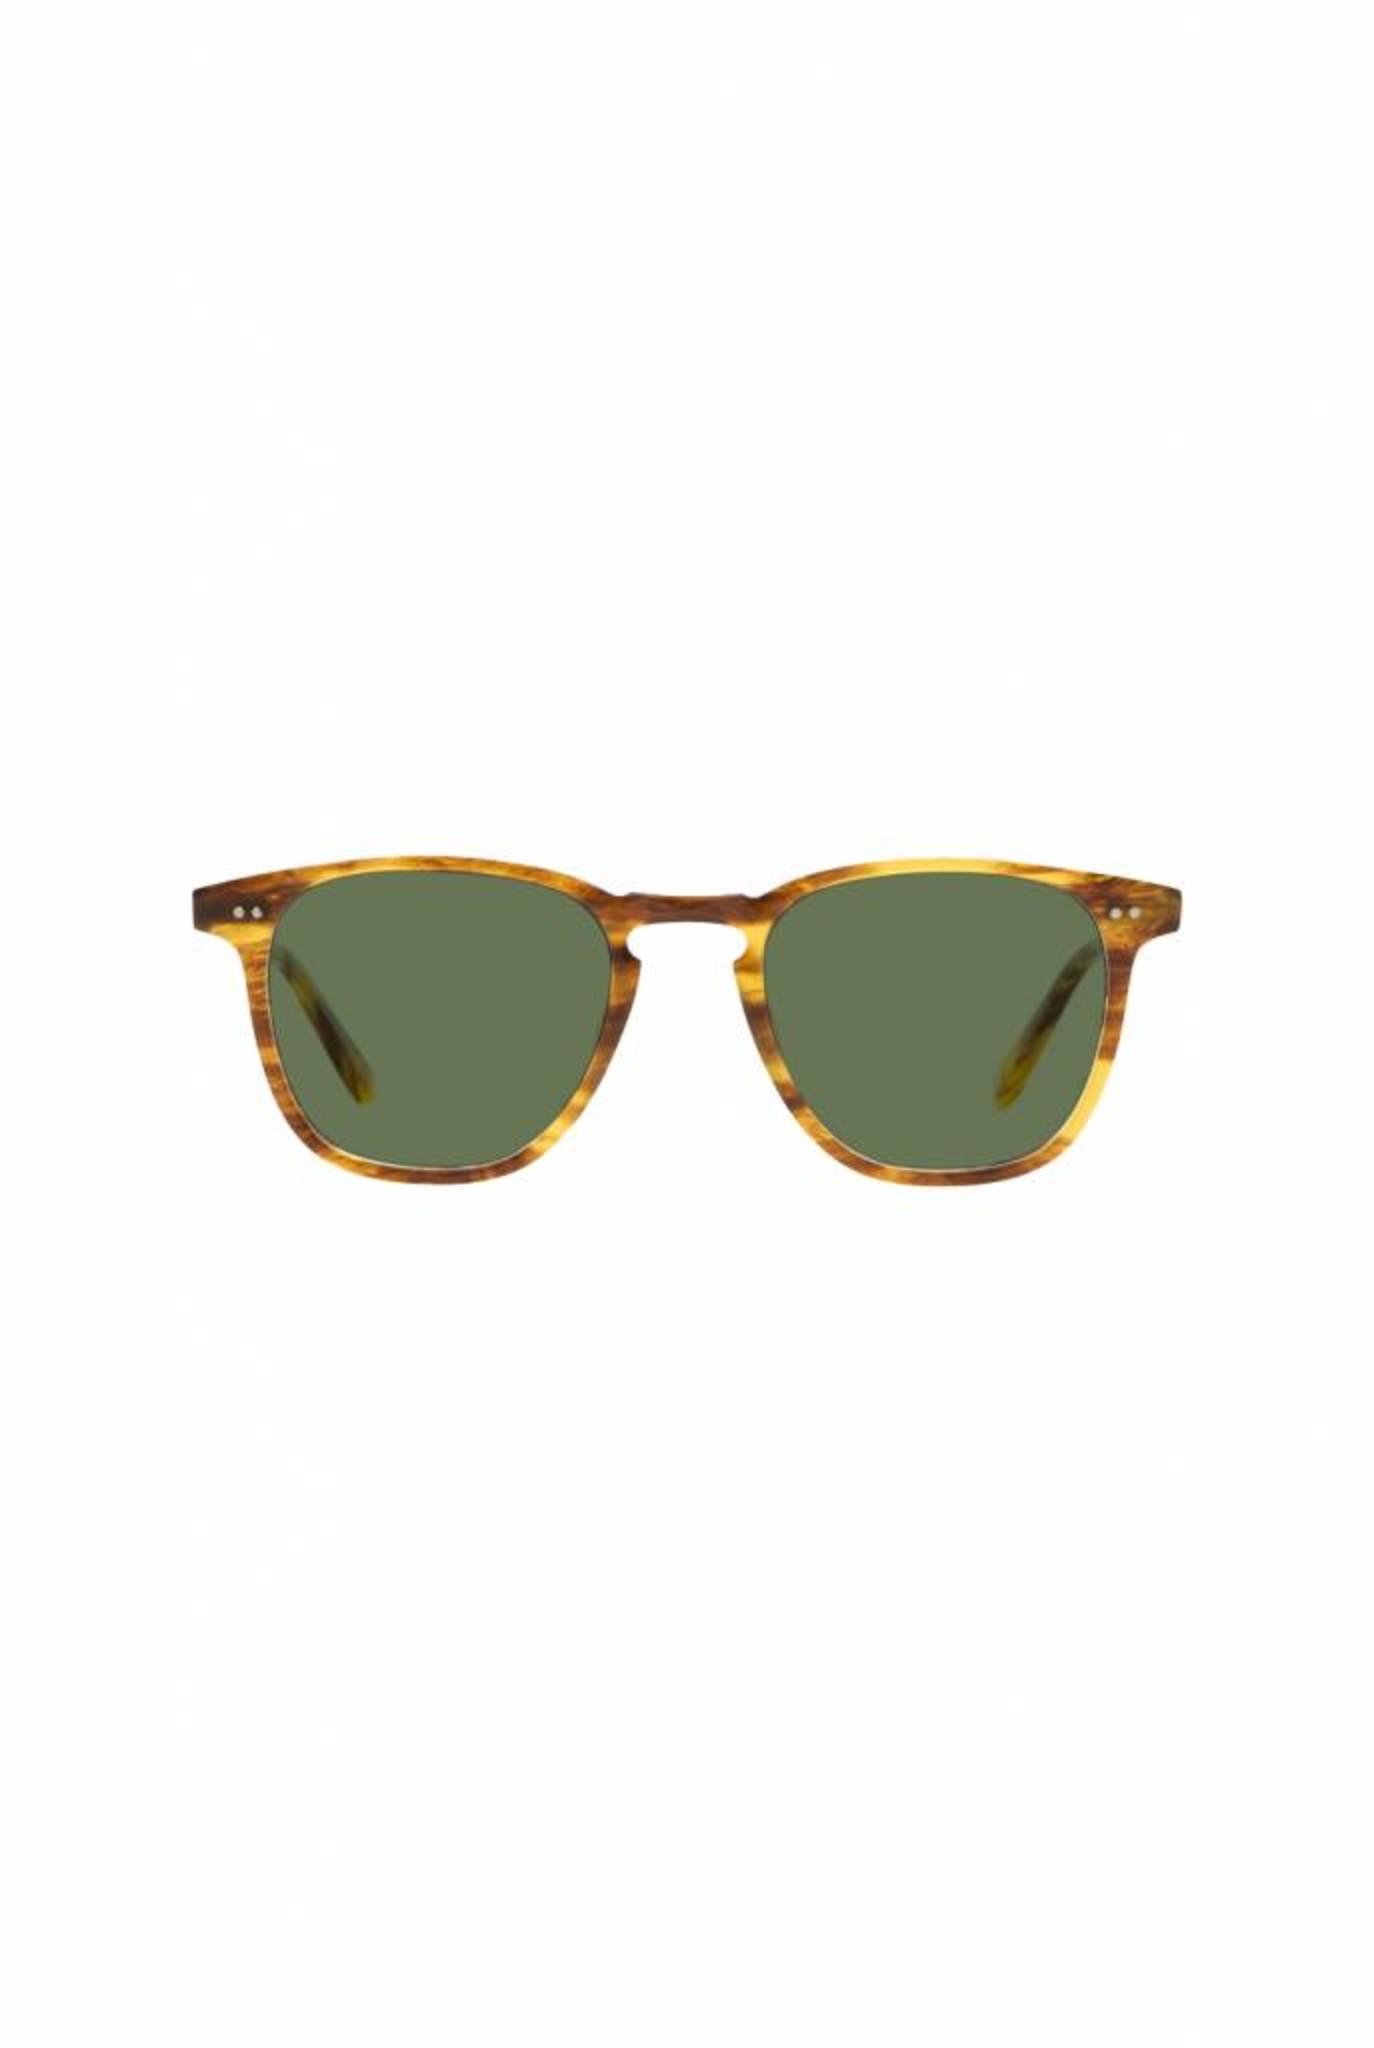 Brooks sunglasses Pinewood/Semi flat pure green